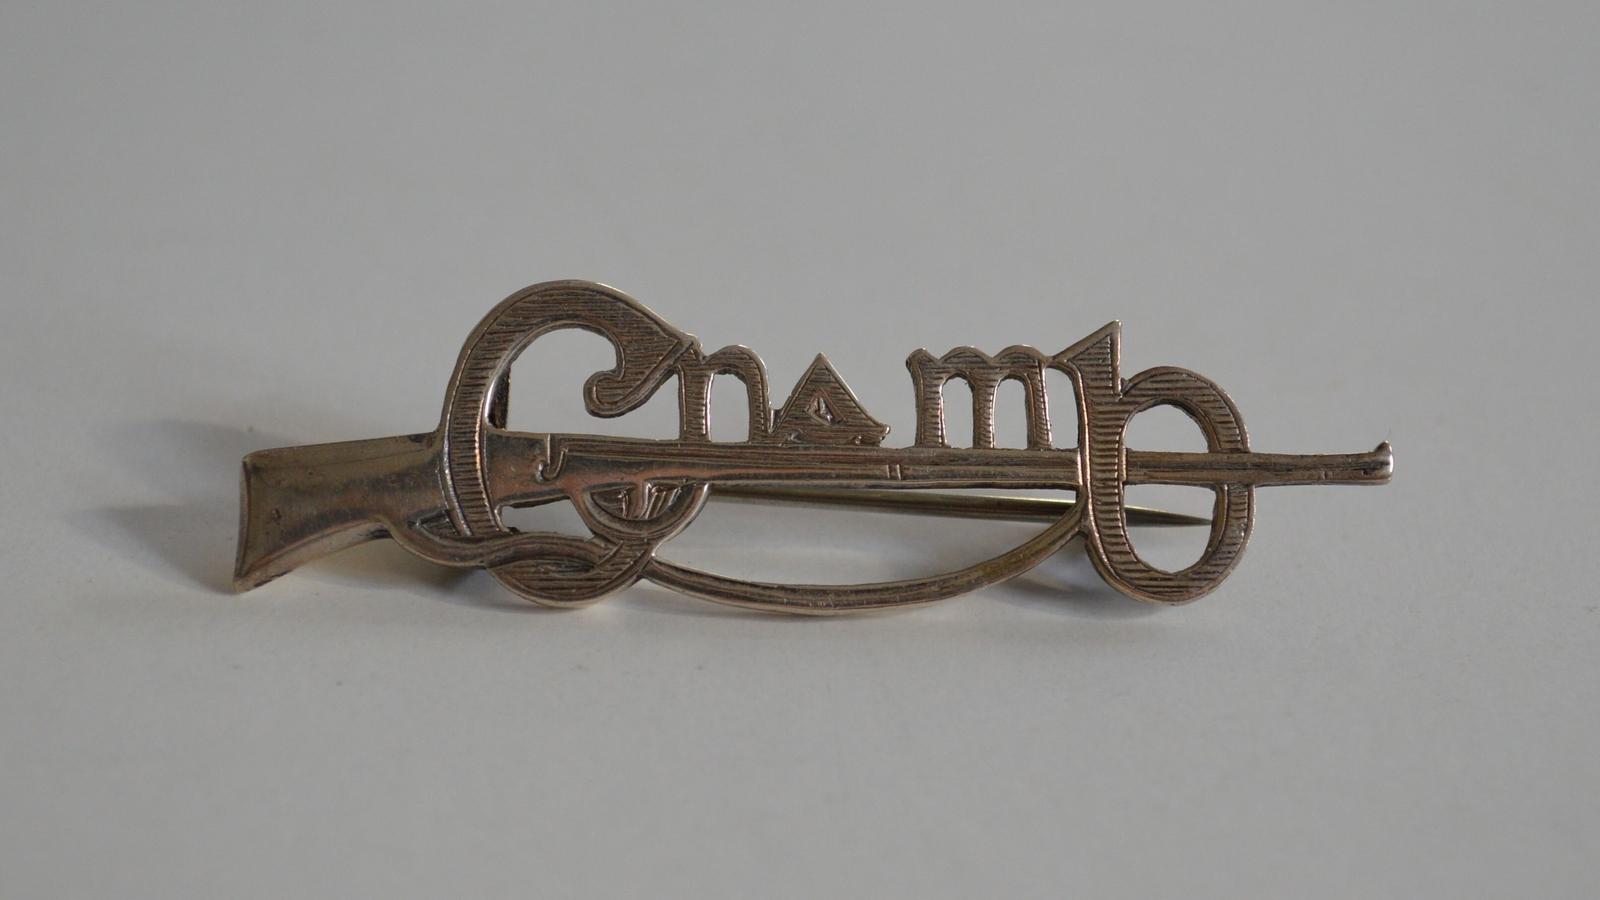 Image - A Cumann na mBan pin. Image courtesy of Kilmainham Gaol Museum, KMGLM 2011.0344